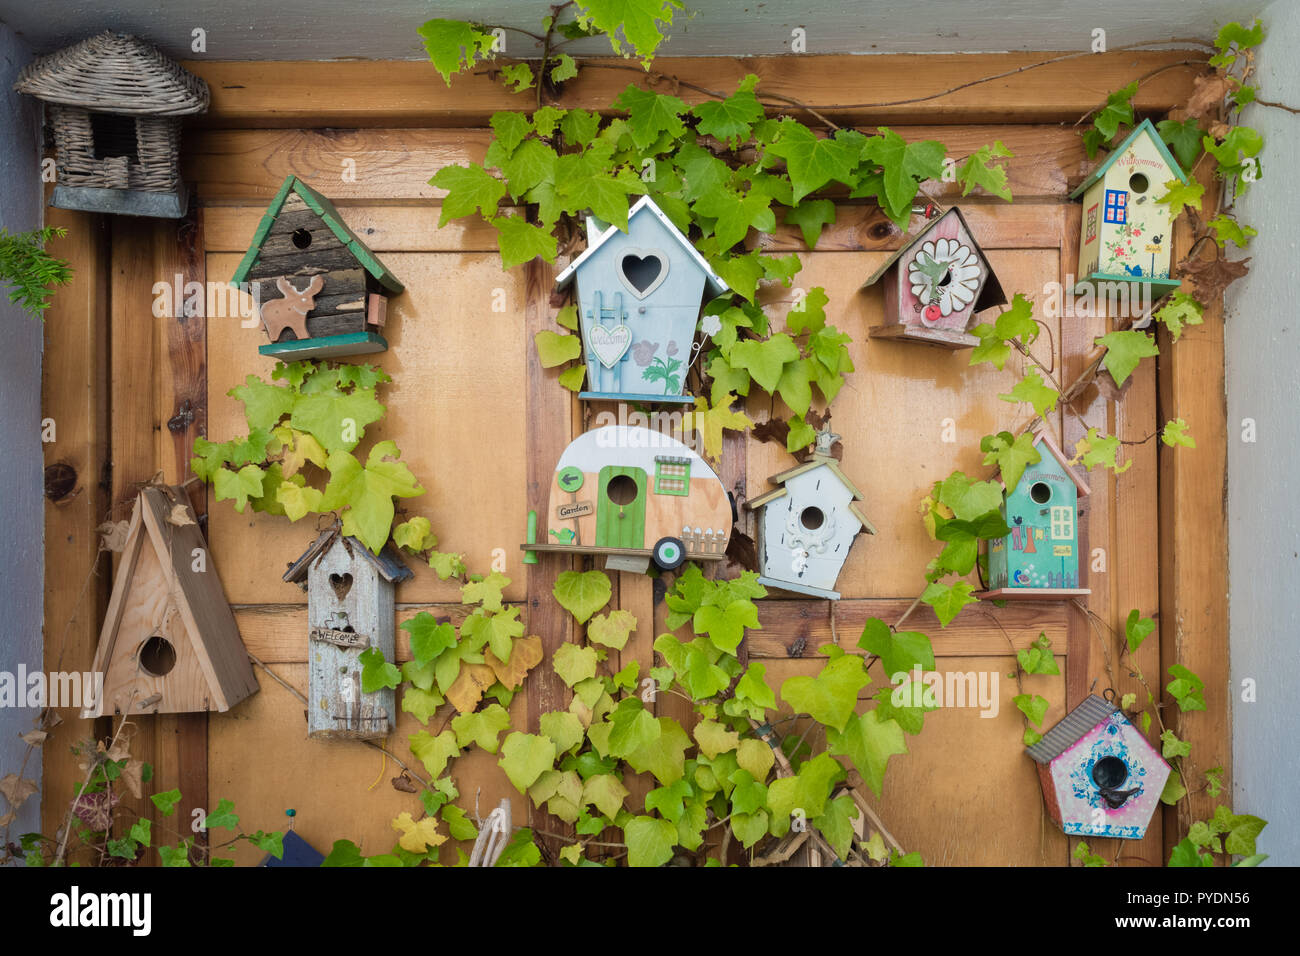 Nk51 Nichoir Nid Cabane Oiseau Bois Couleur Pet Supplies